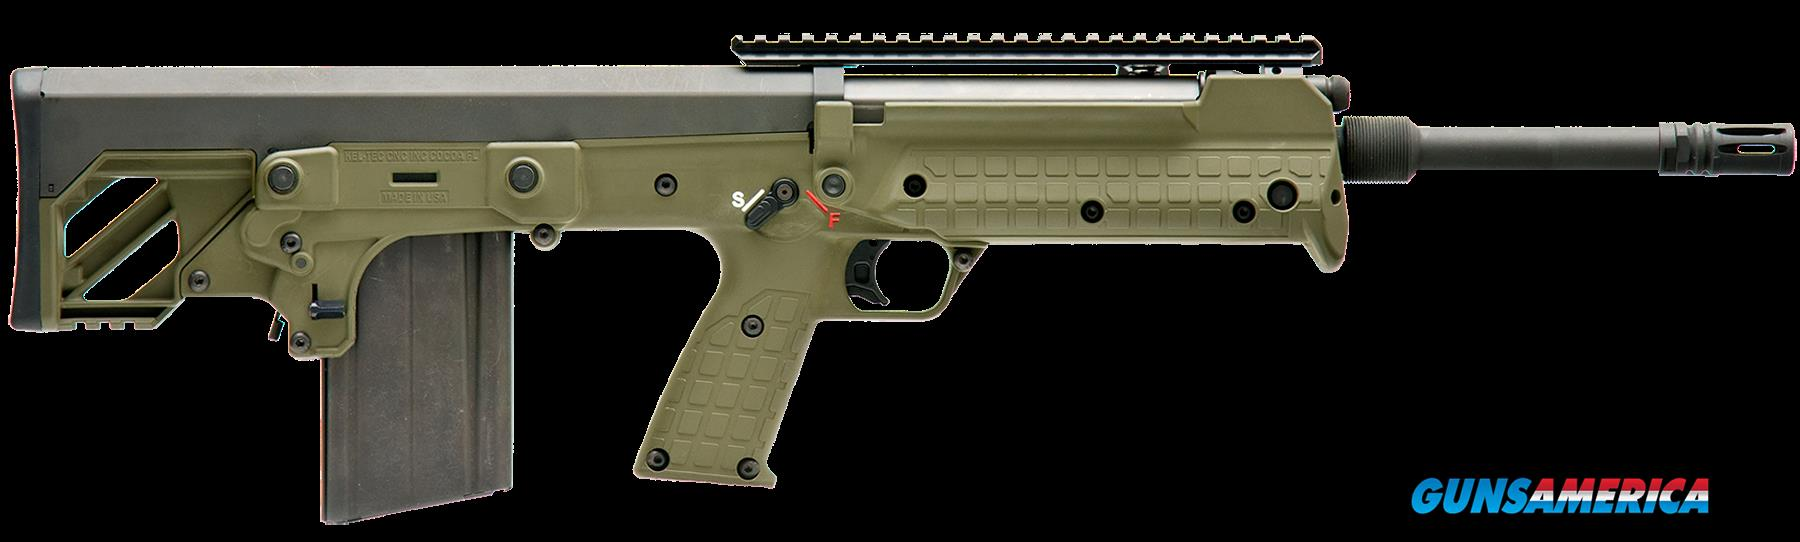 Kel-tec Rfb, Kel Rfb24tan   308 Win  24in           Cerakote  Guns > Pistols > 1911 Pistol Copies (non-Colt)